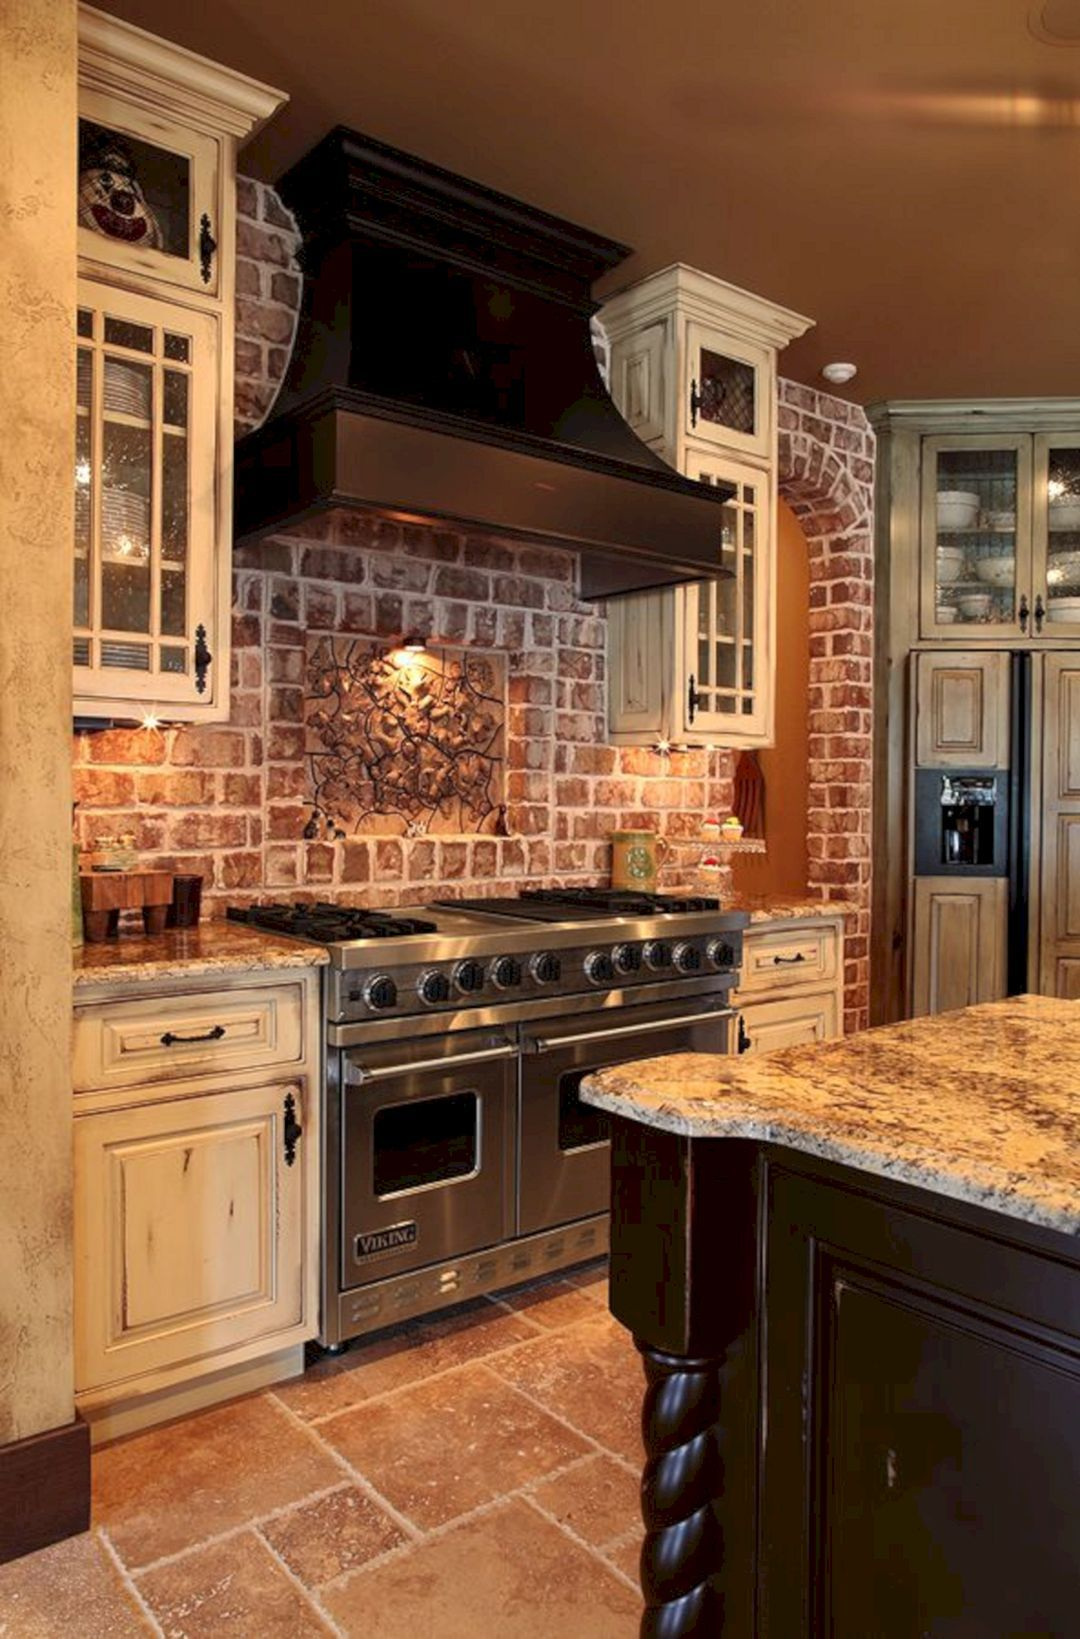 20 beautiful red brick kitchen design ideas beautiful kitchen cabinets brick kitchen on kitchen cabinets rustic farmhouse style id=19957